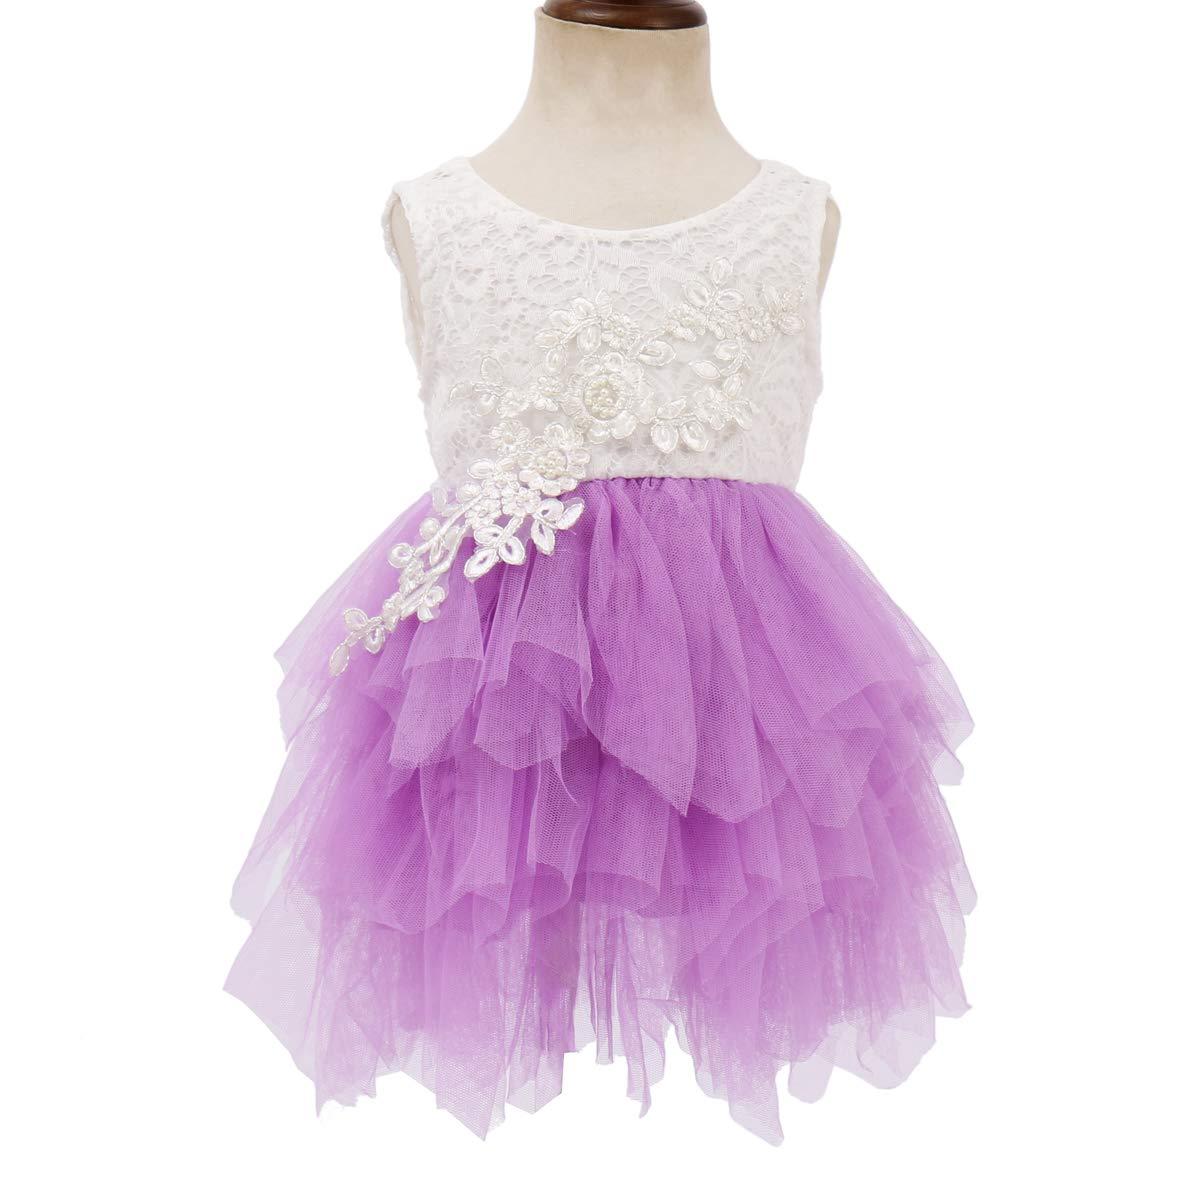 OBEEII Kid Girl Lace Flower High Low Tutu Dress Junior Bridesmaid Graduation Pageant